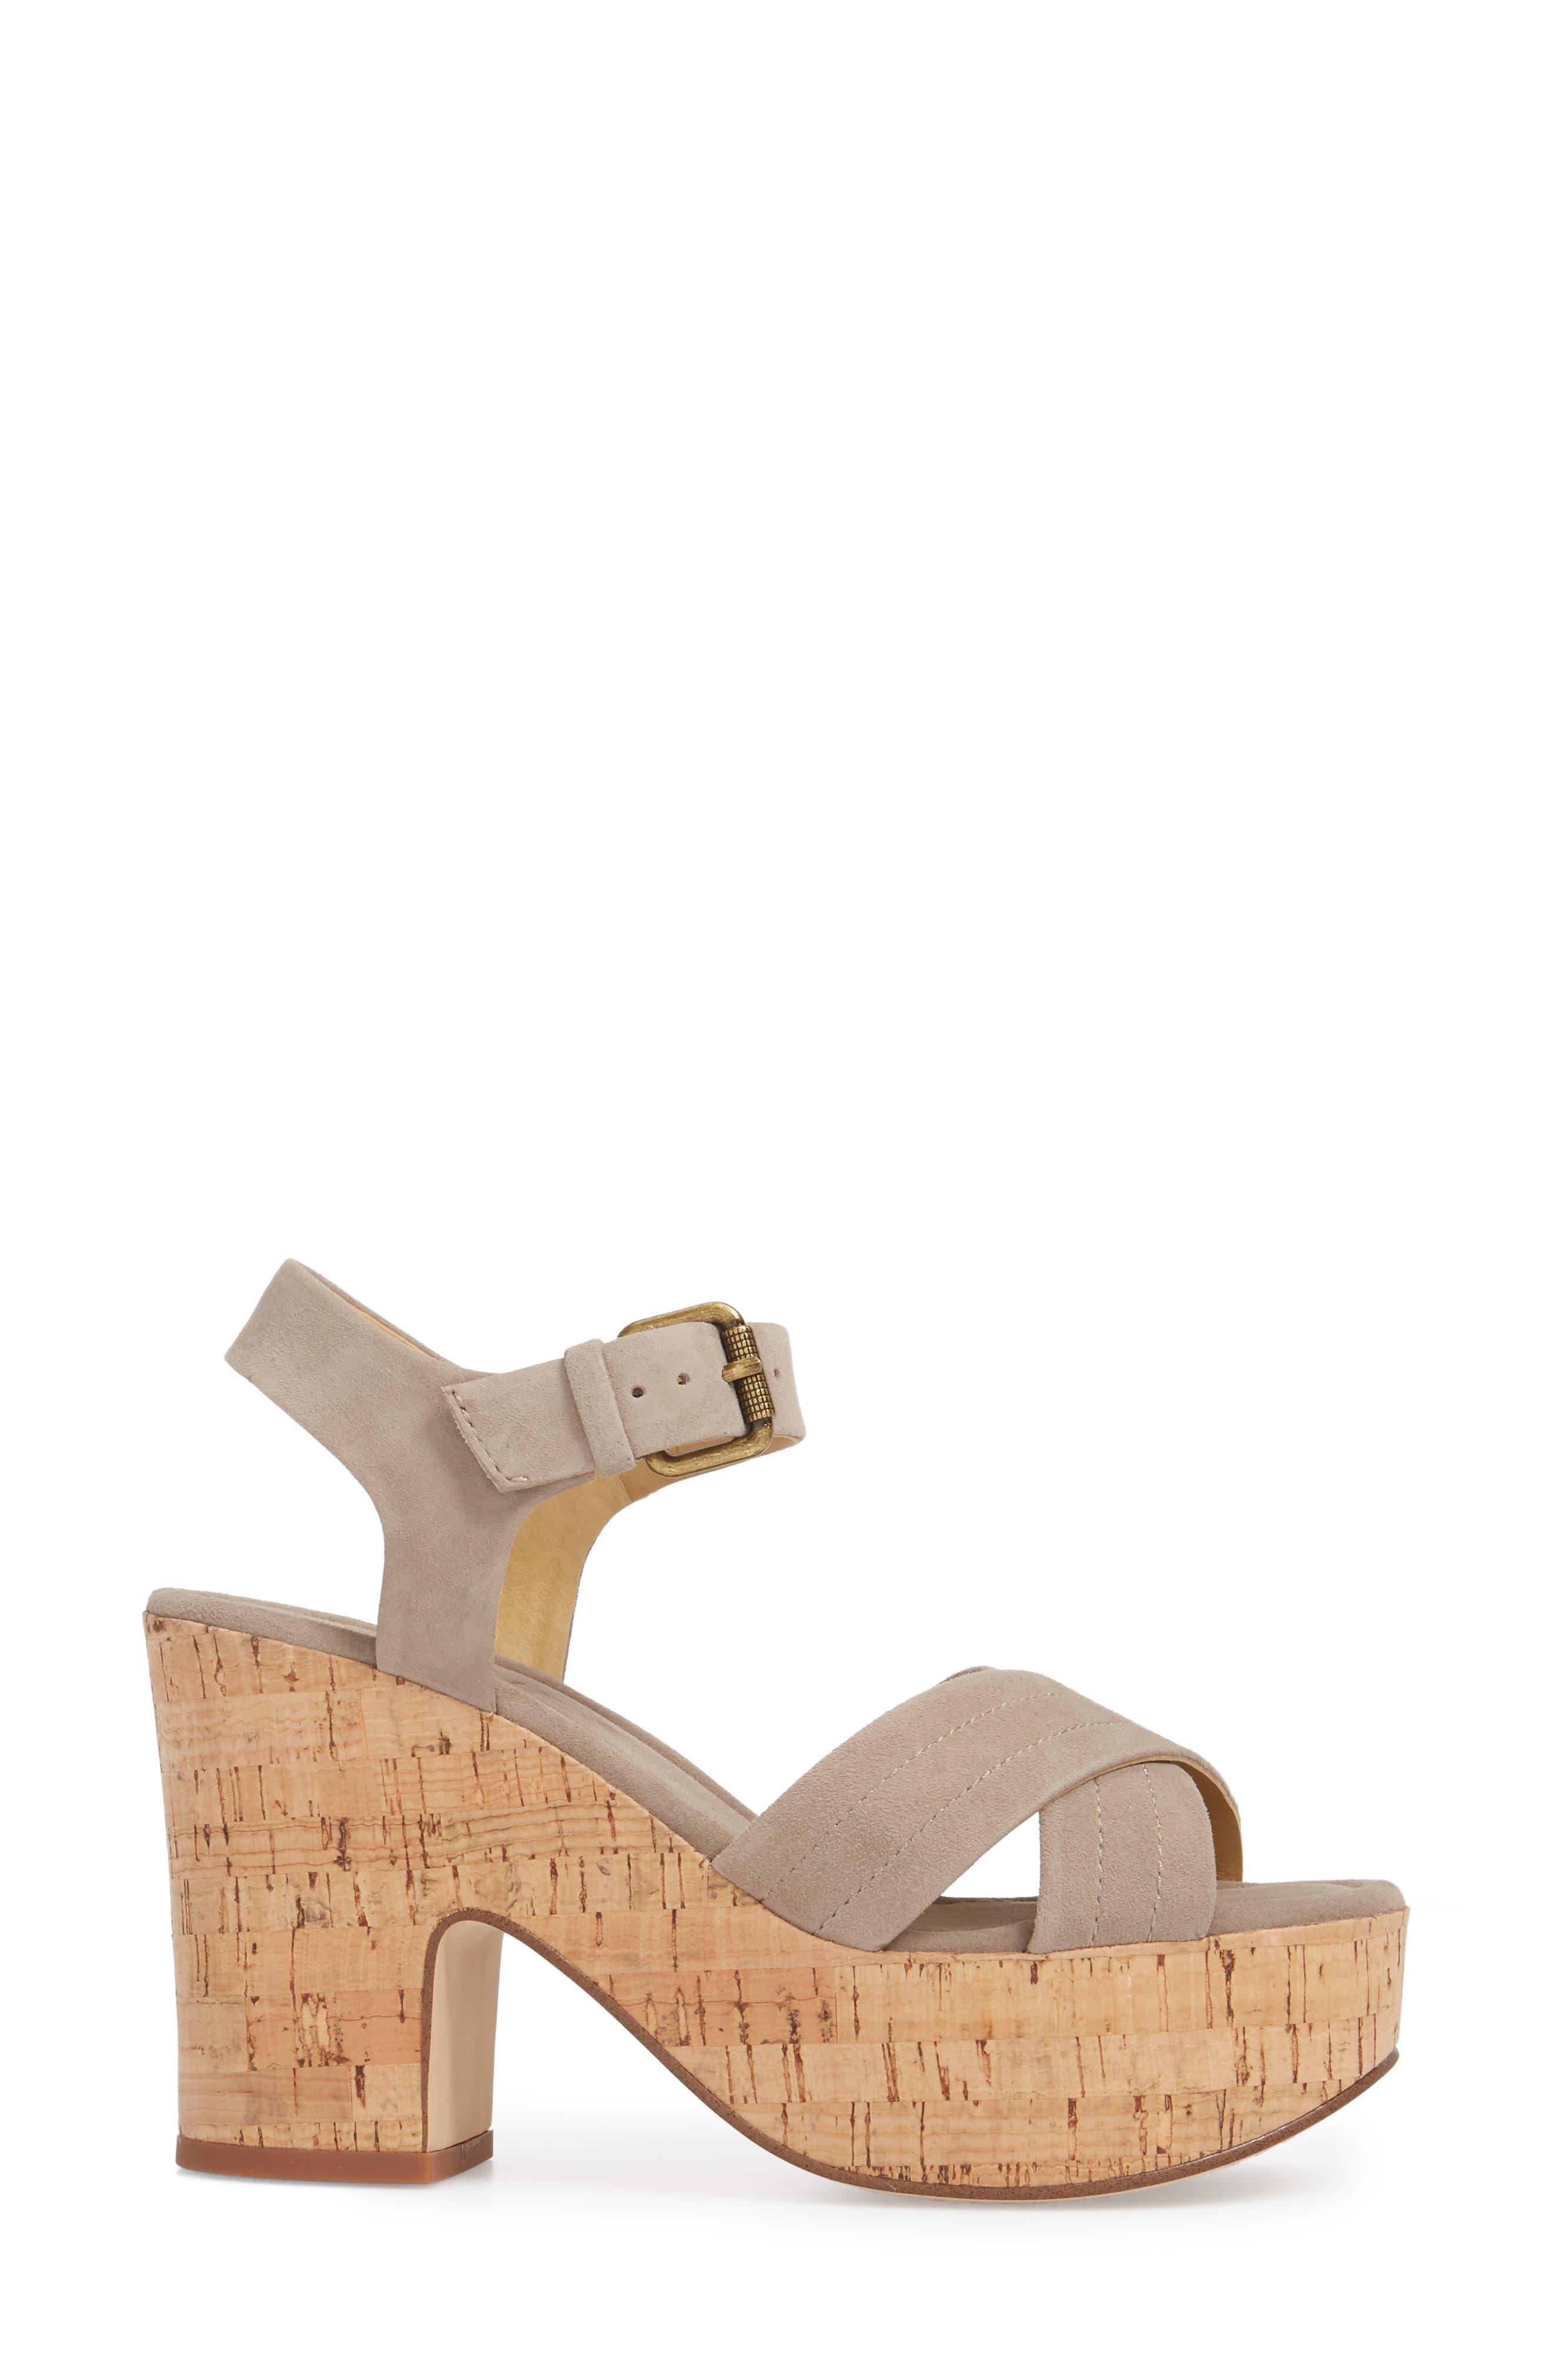 Flaire Platform Sandal,                             Alternate thumbnail 3, color,                             TAUPE SUEDE